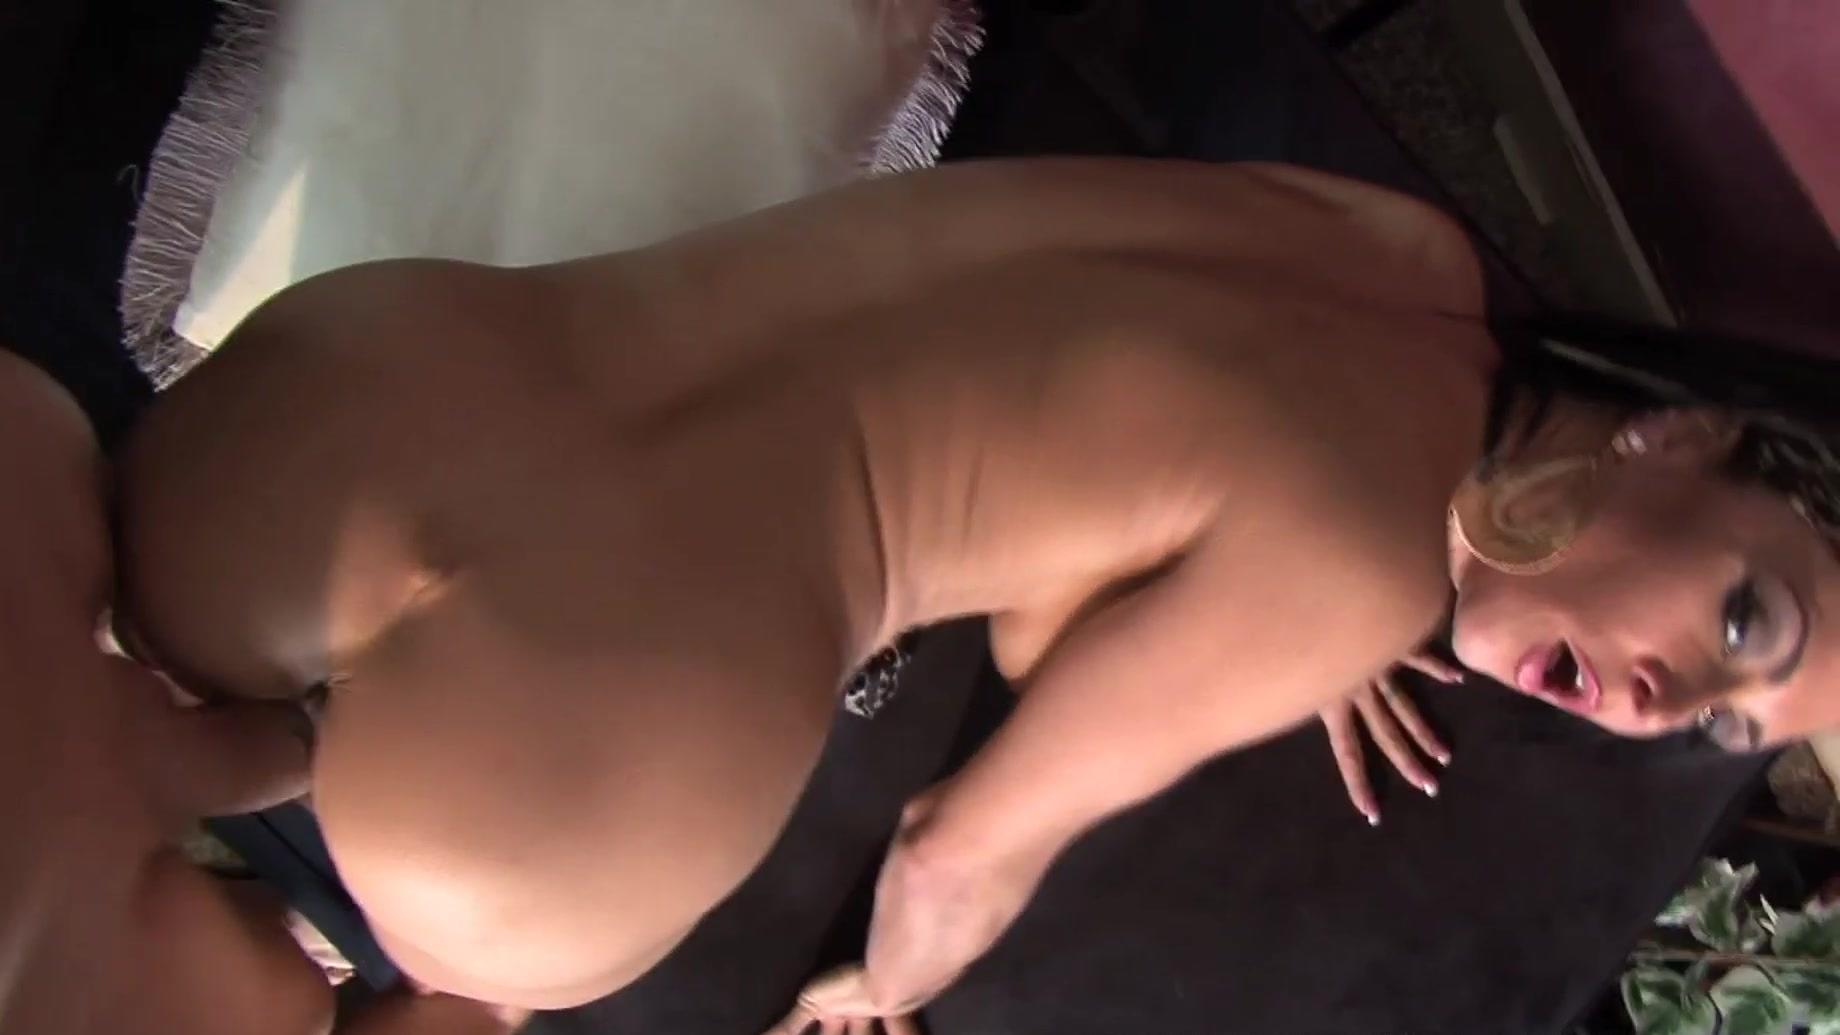 Jessicas panties clit